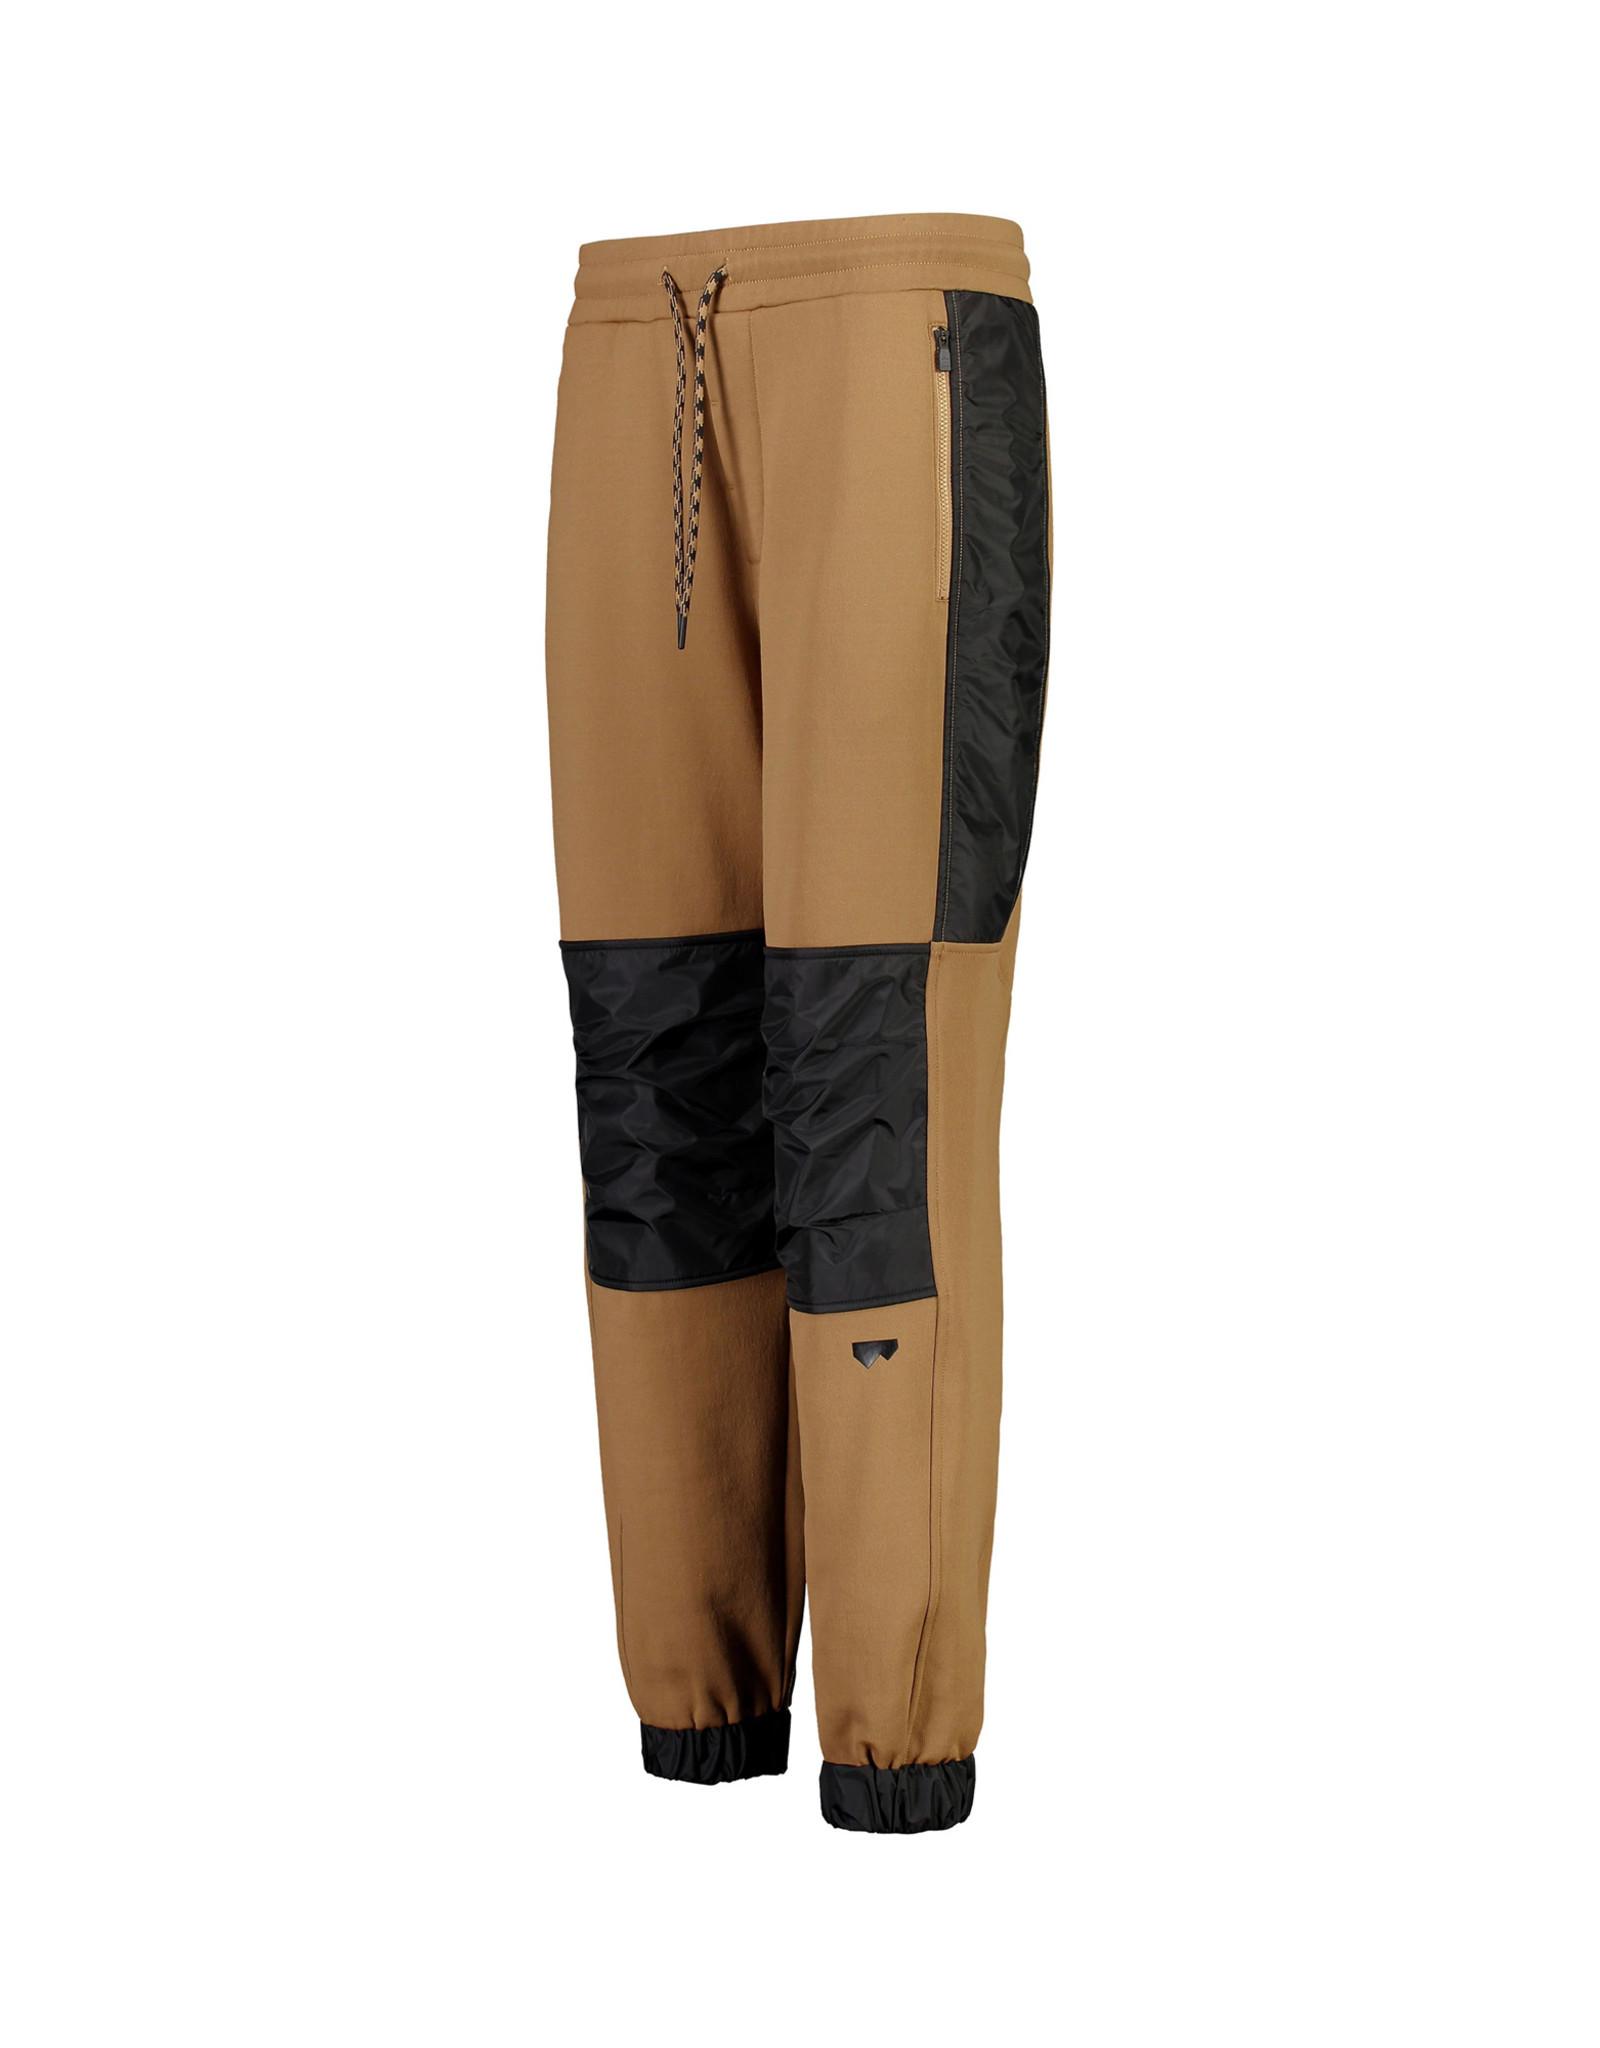 Mons Royale Mons Royale Decade Pants Femme